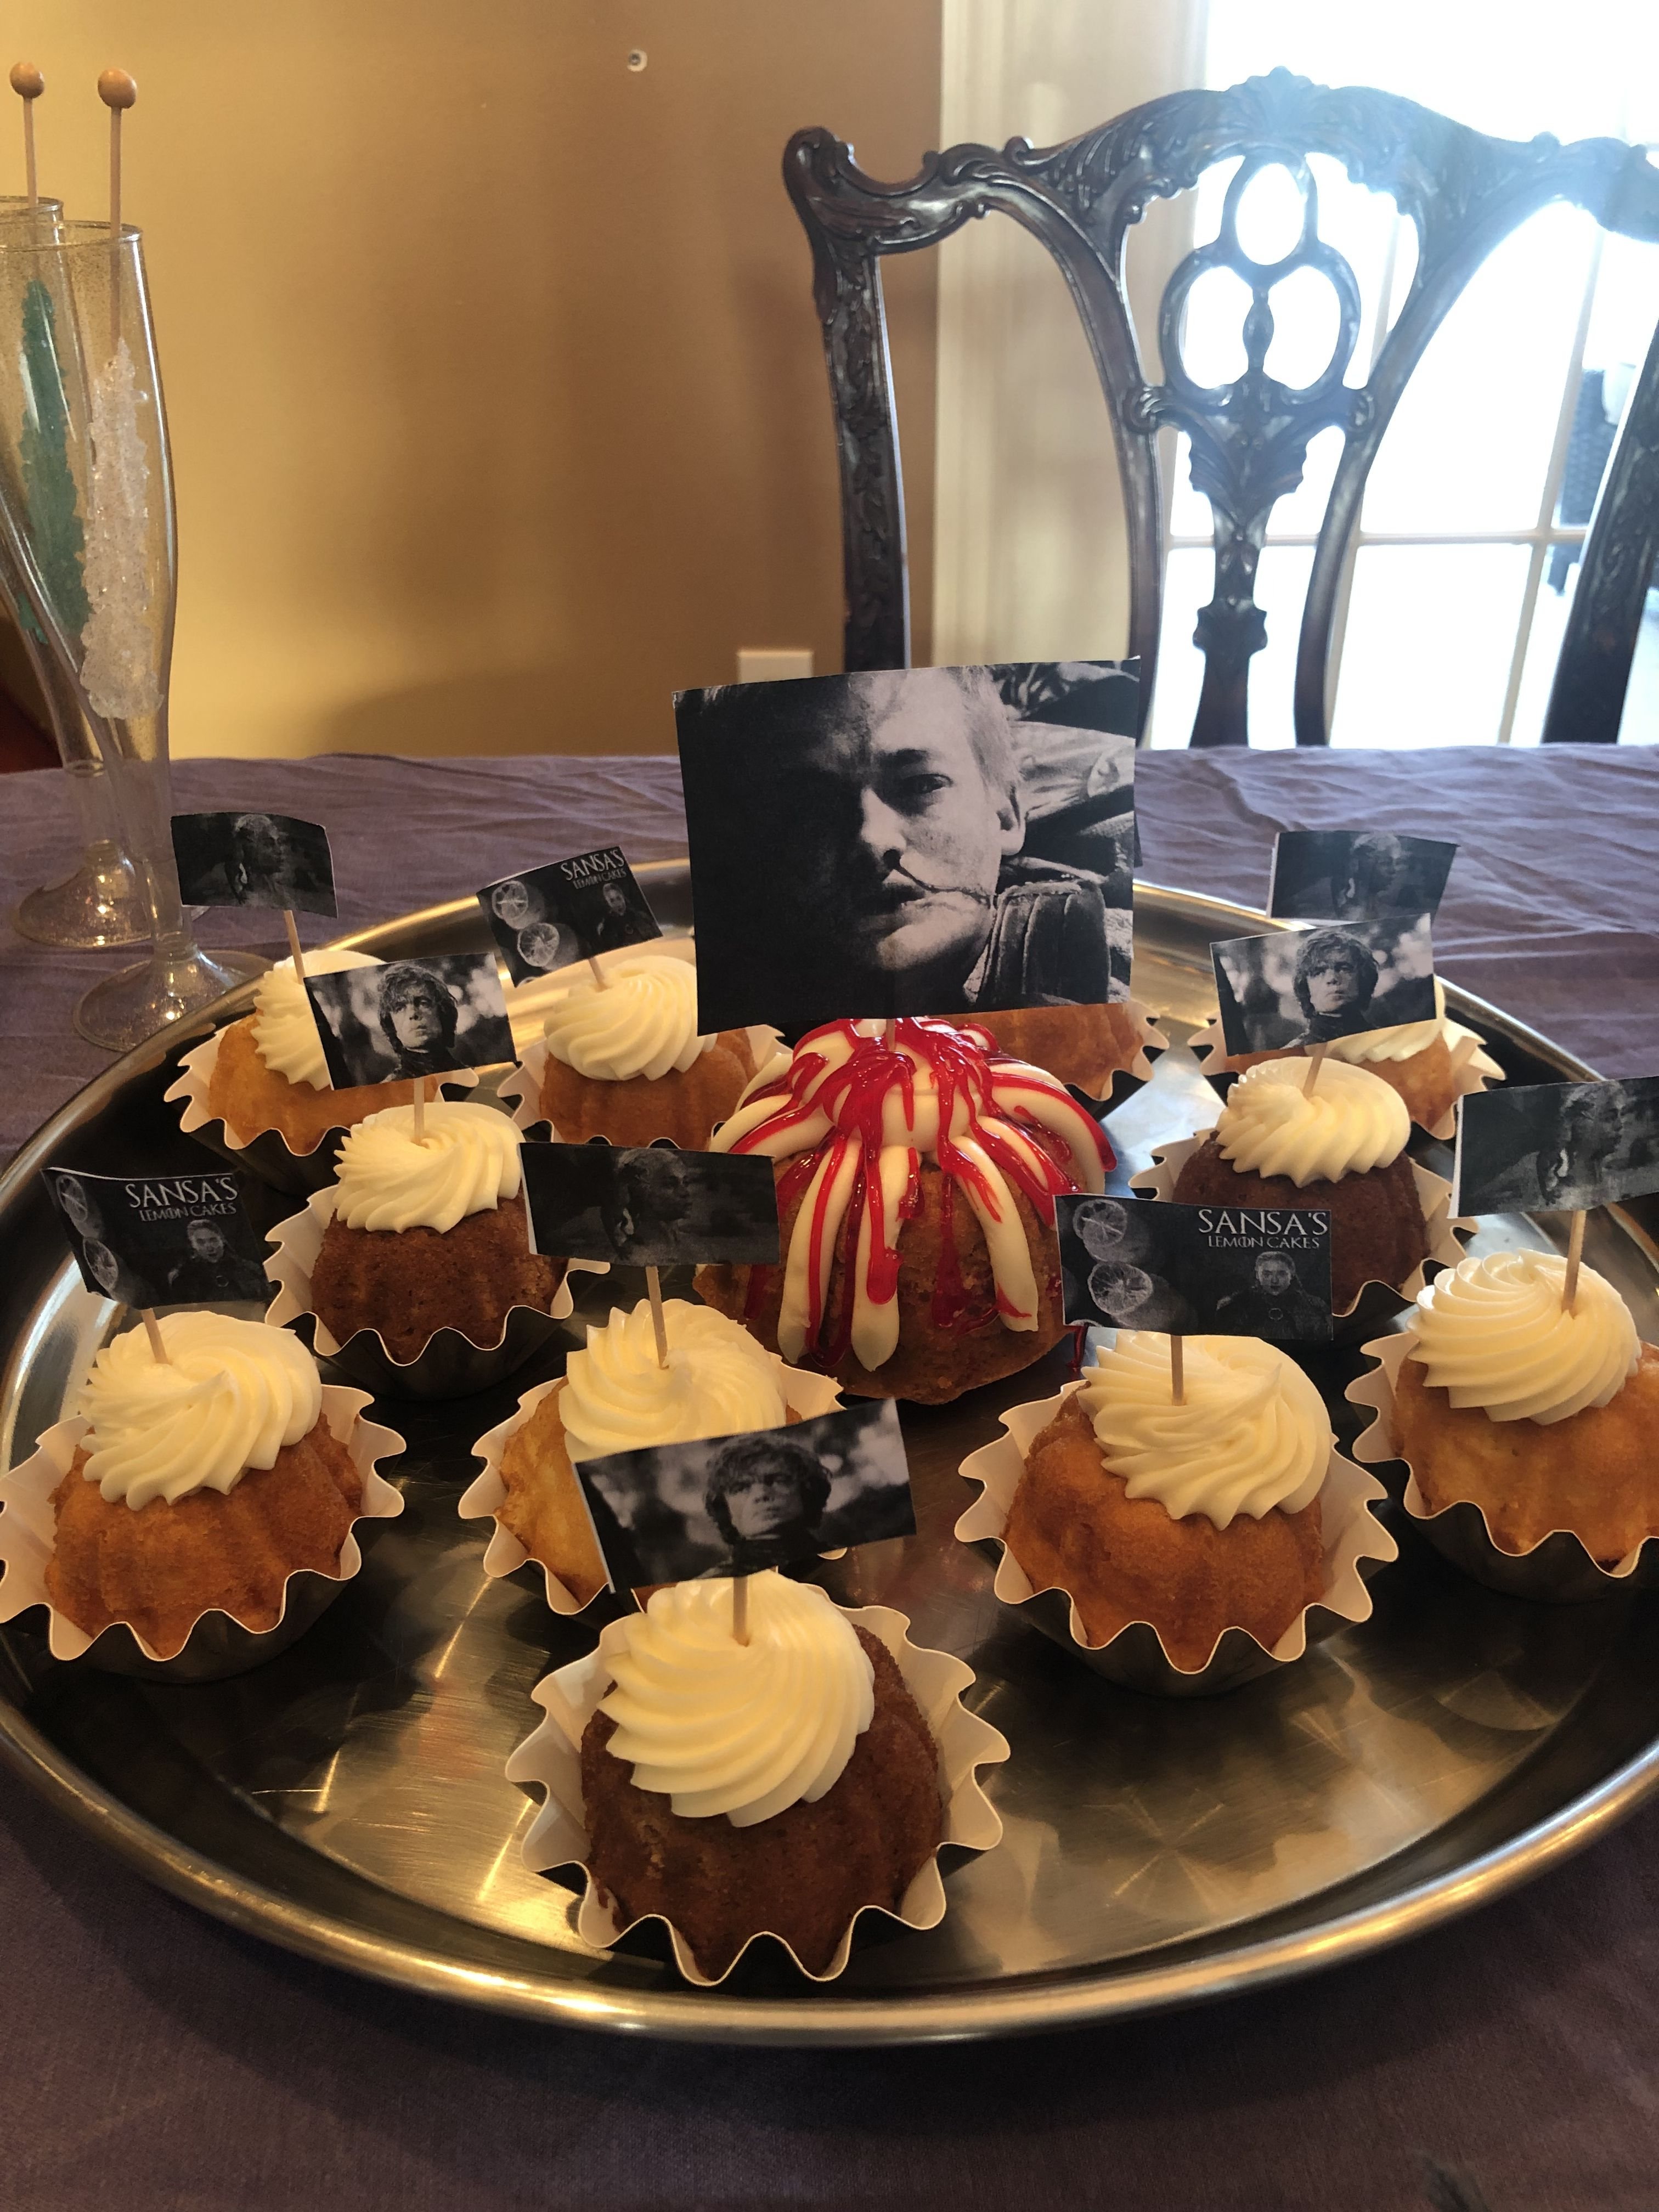 Game of thrones nothing bundt cakes bundt cake store